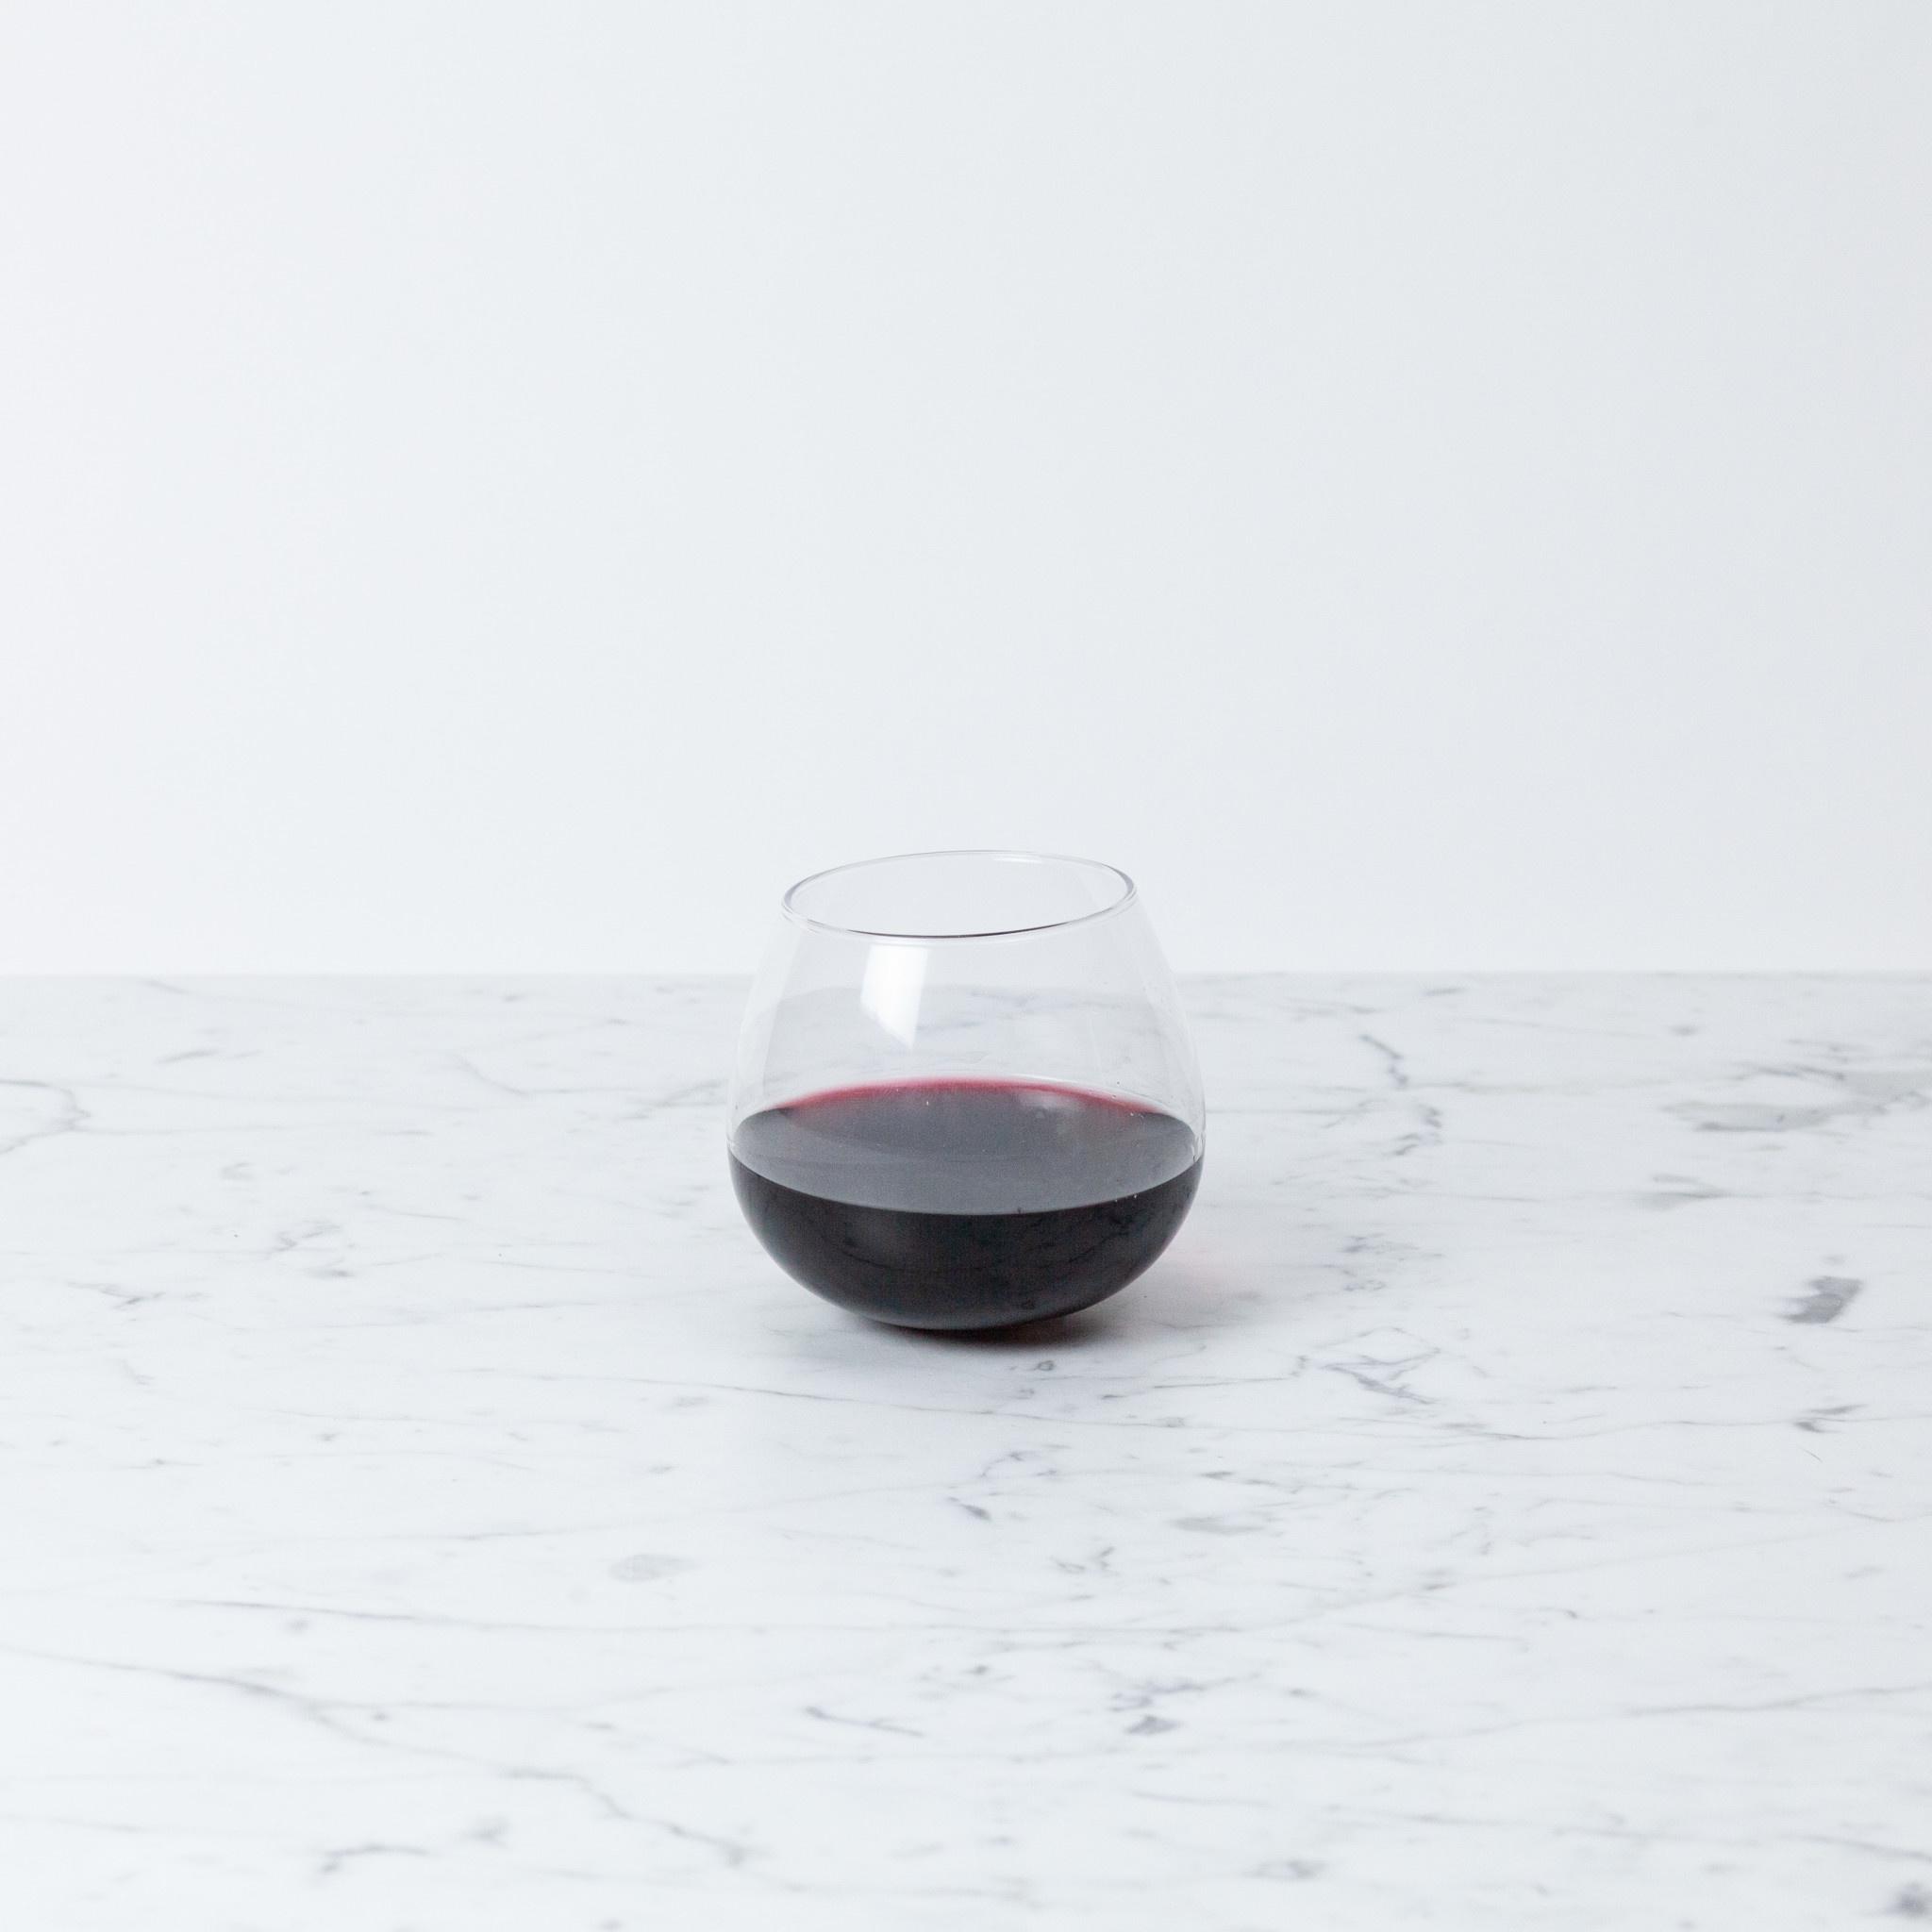 Japanese Wobbling Round Bottom Wine Glass - 17 oz